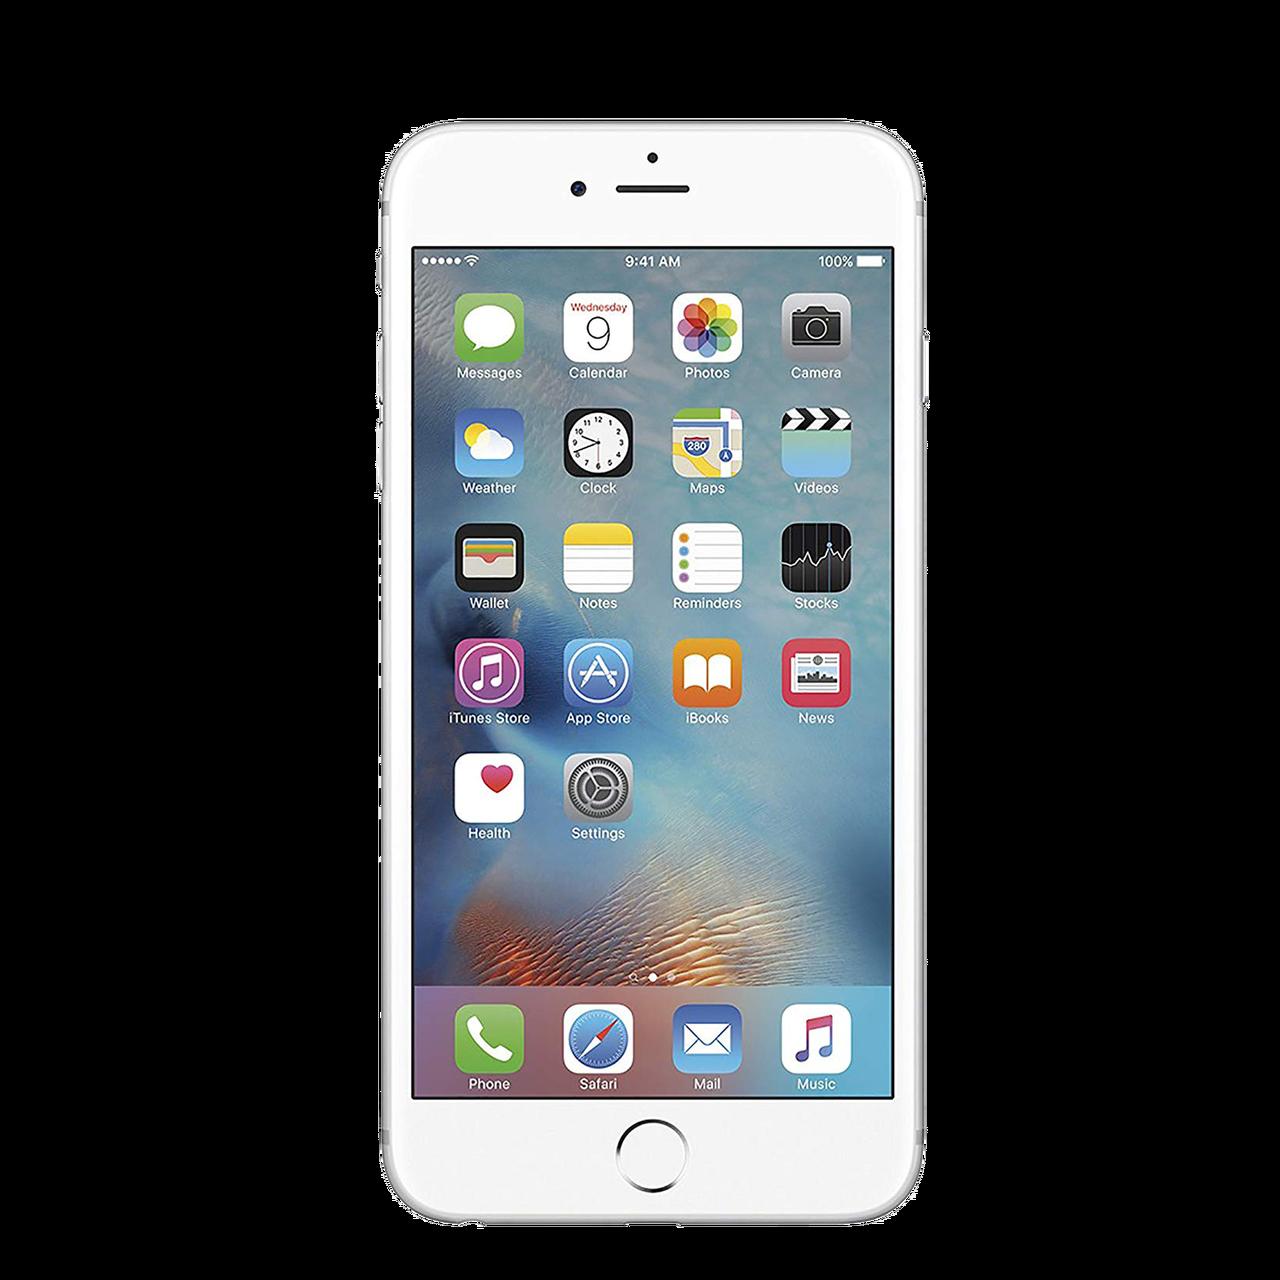 iphone-6plus-thumbnail-75-percent.jpg